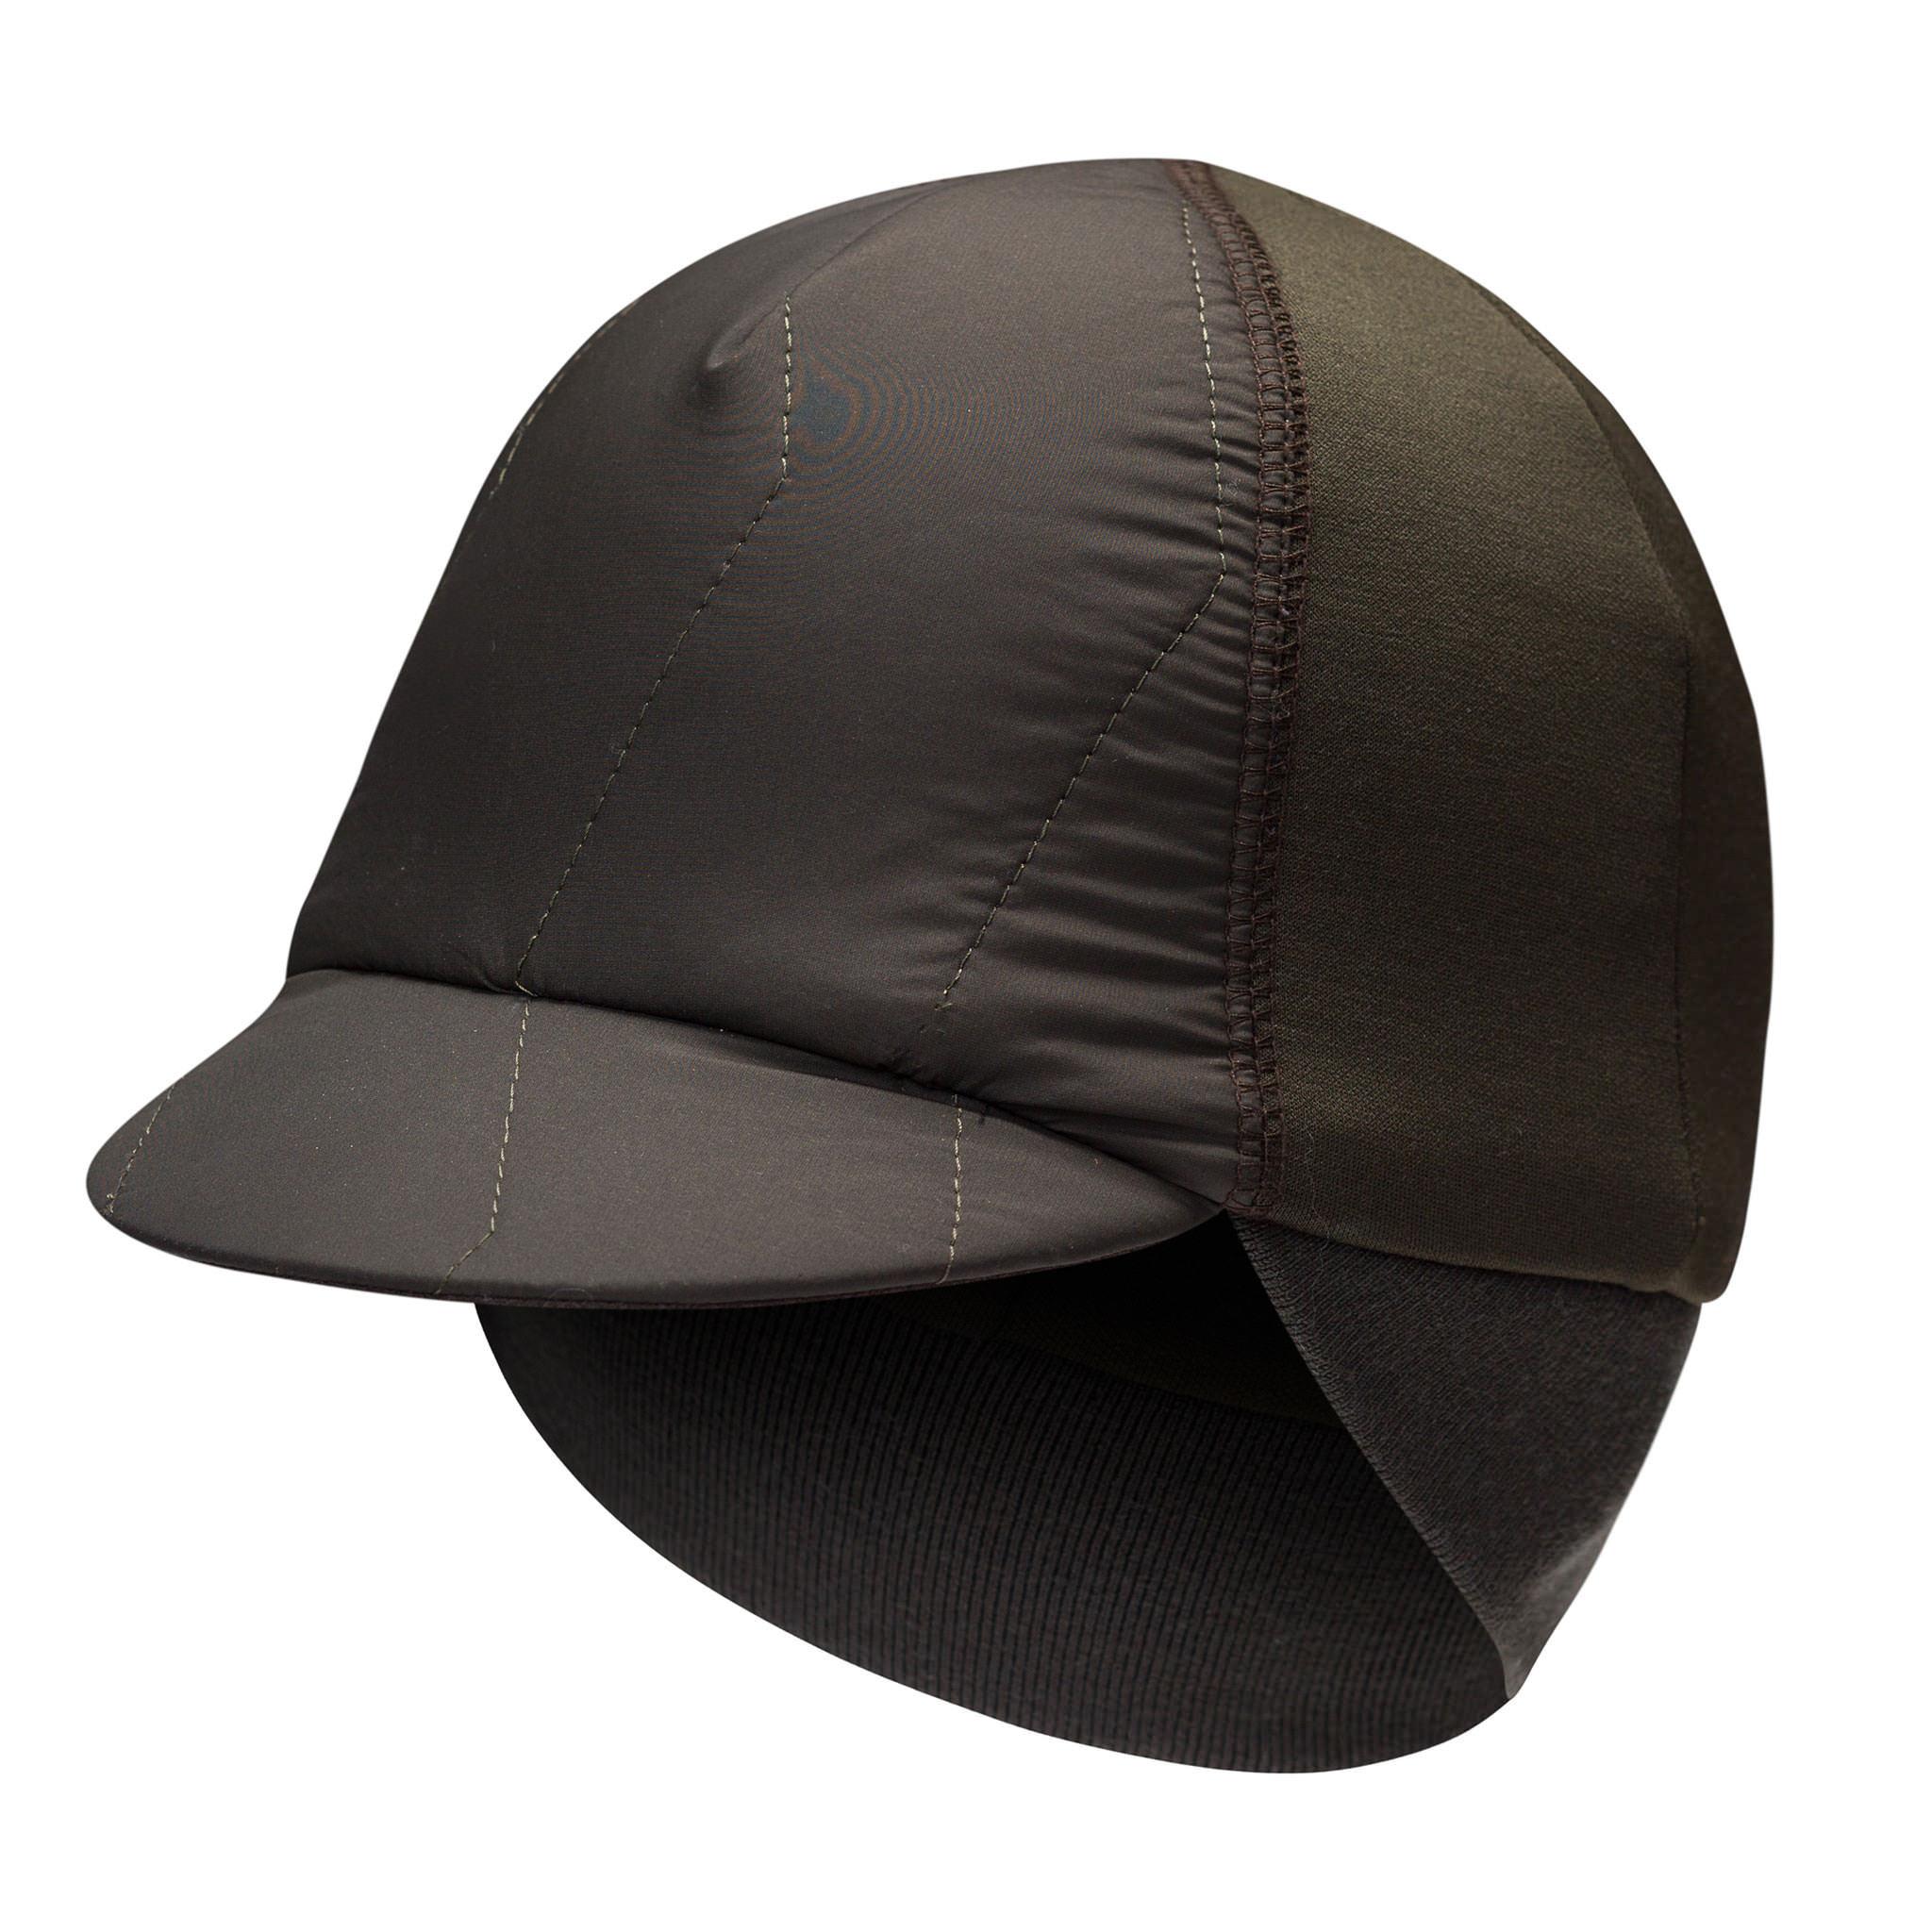 Rapha & Raeburn Winter Hat